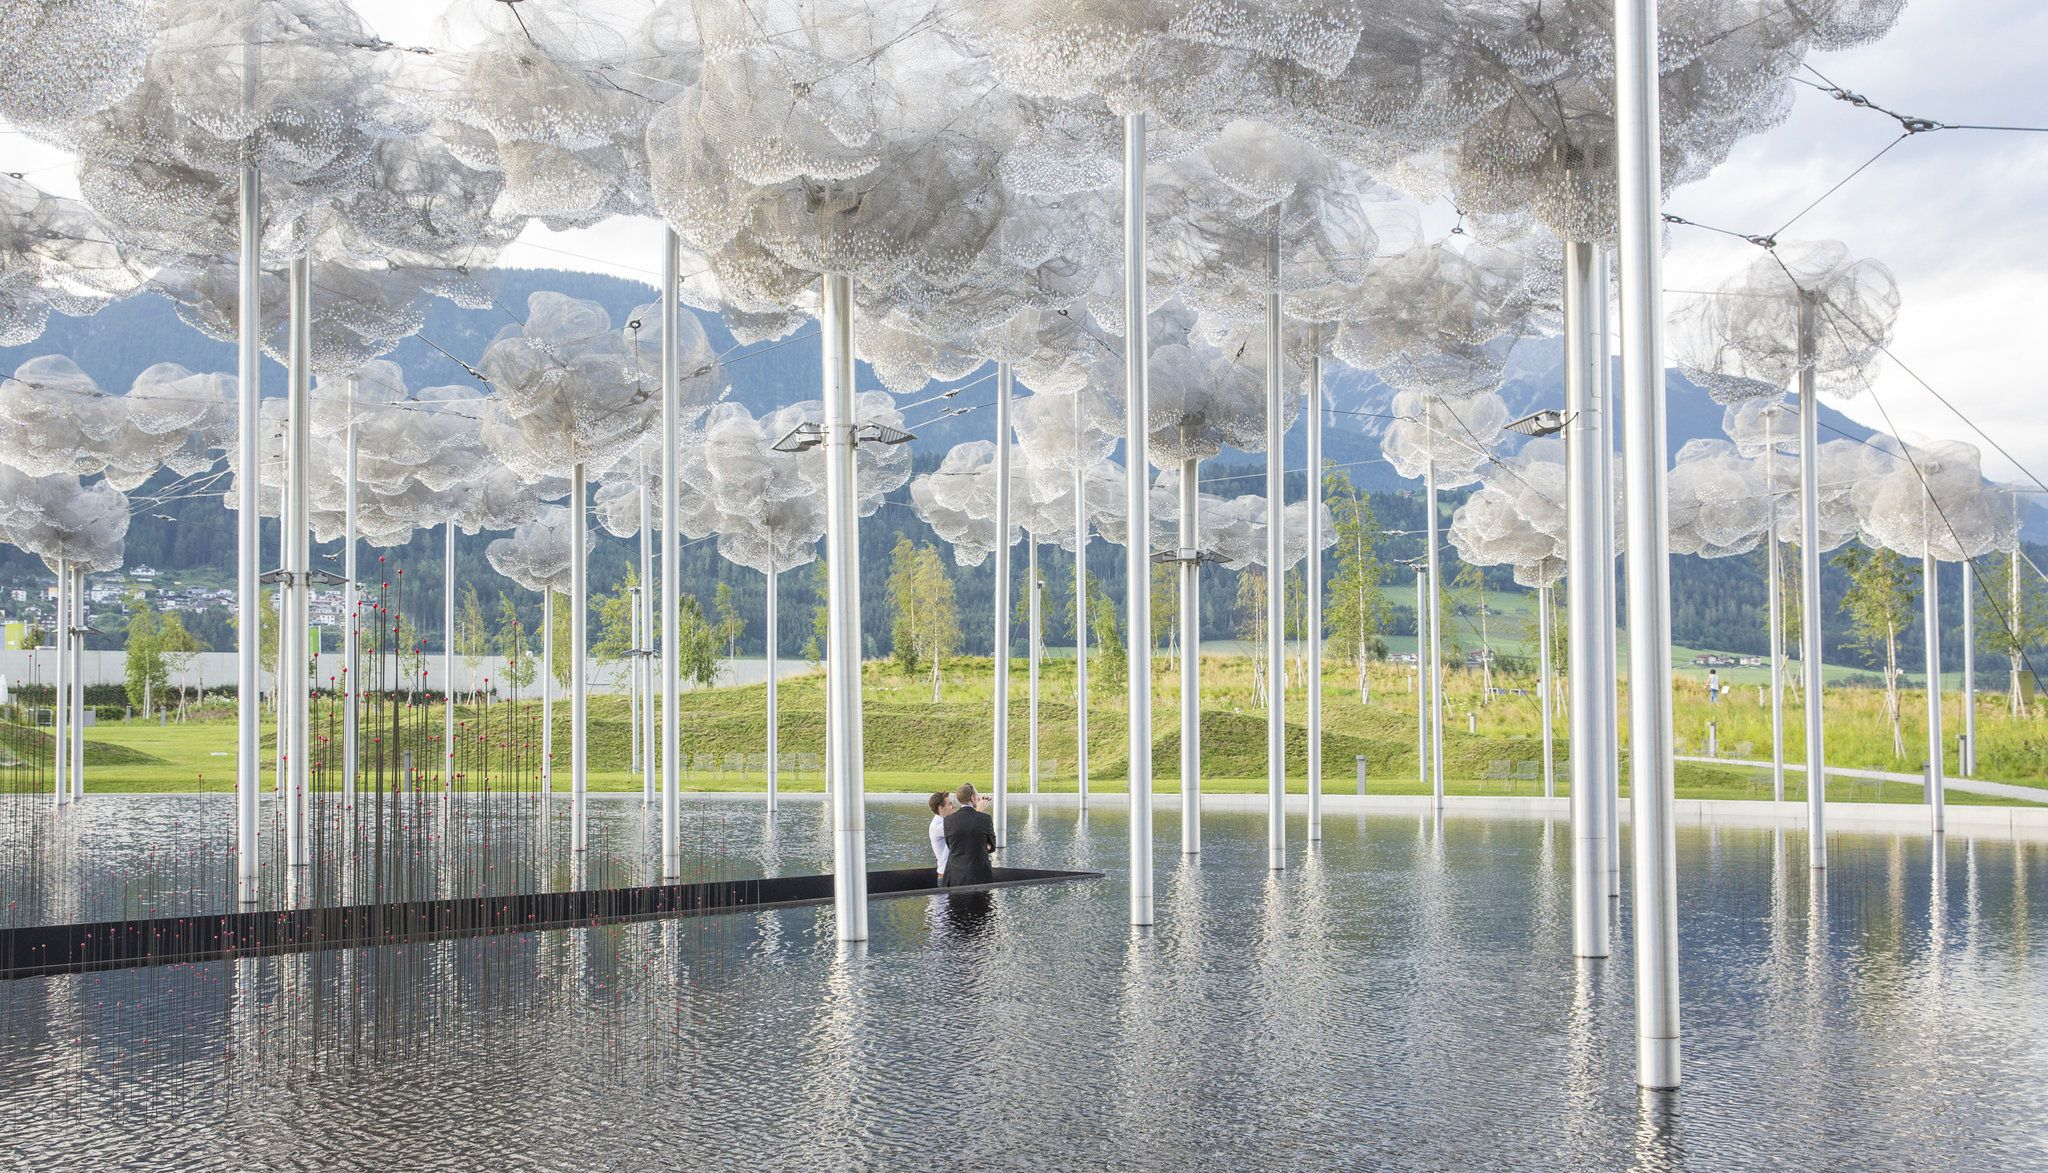 Serena Infantil Imaginativo  Swarovski, Maker of All Things Bejeweled, Tries On a Hoodie (Published 2016)  | Artistic installation, Swarovski crystal world, Installation